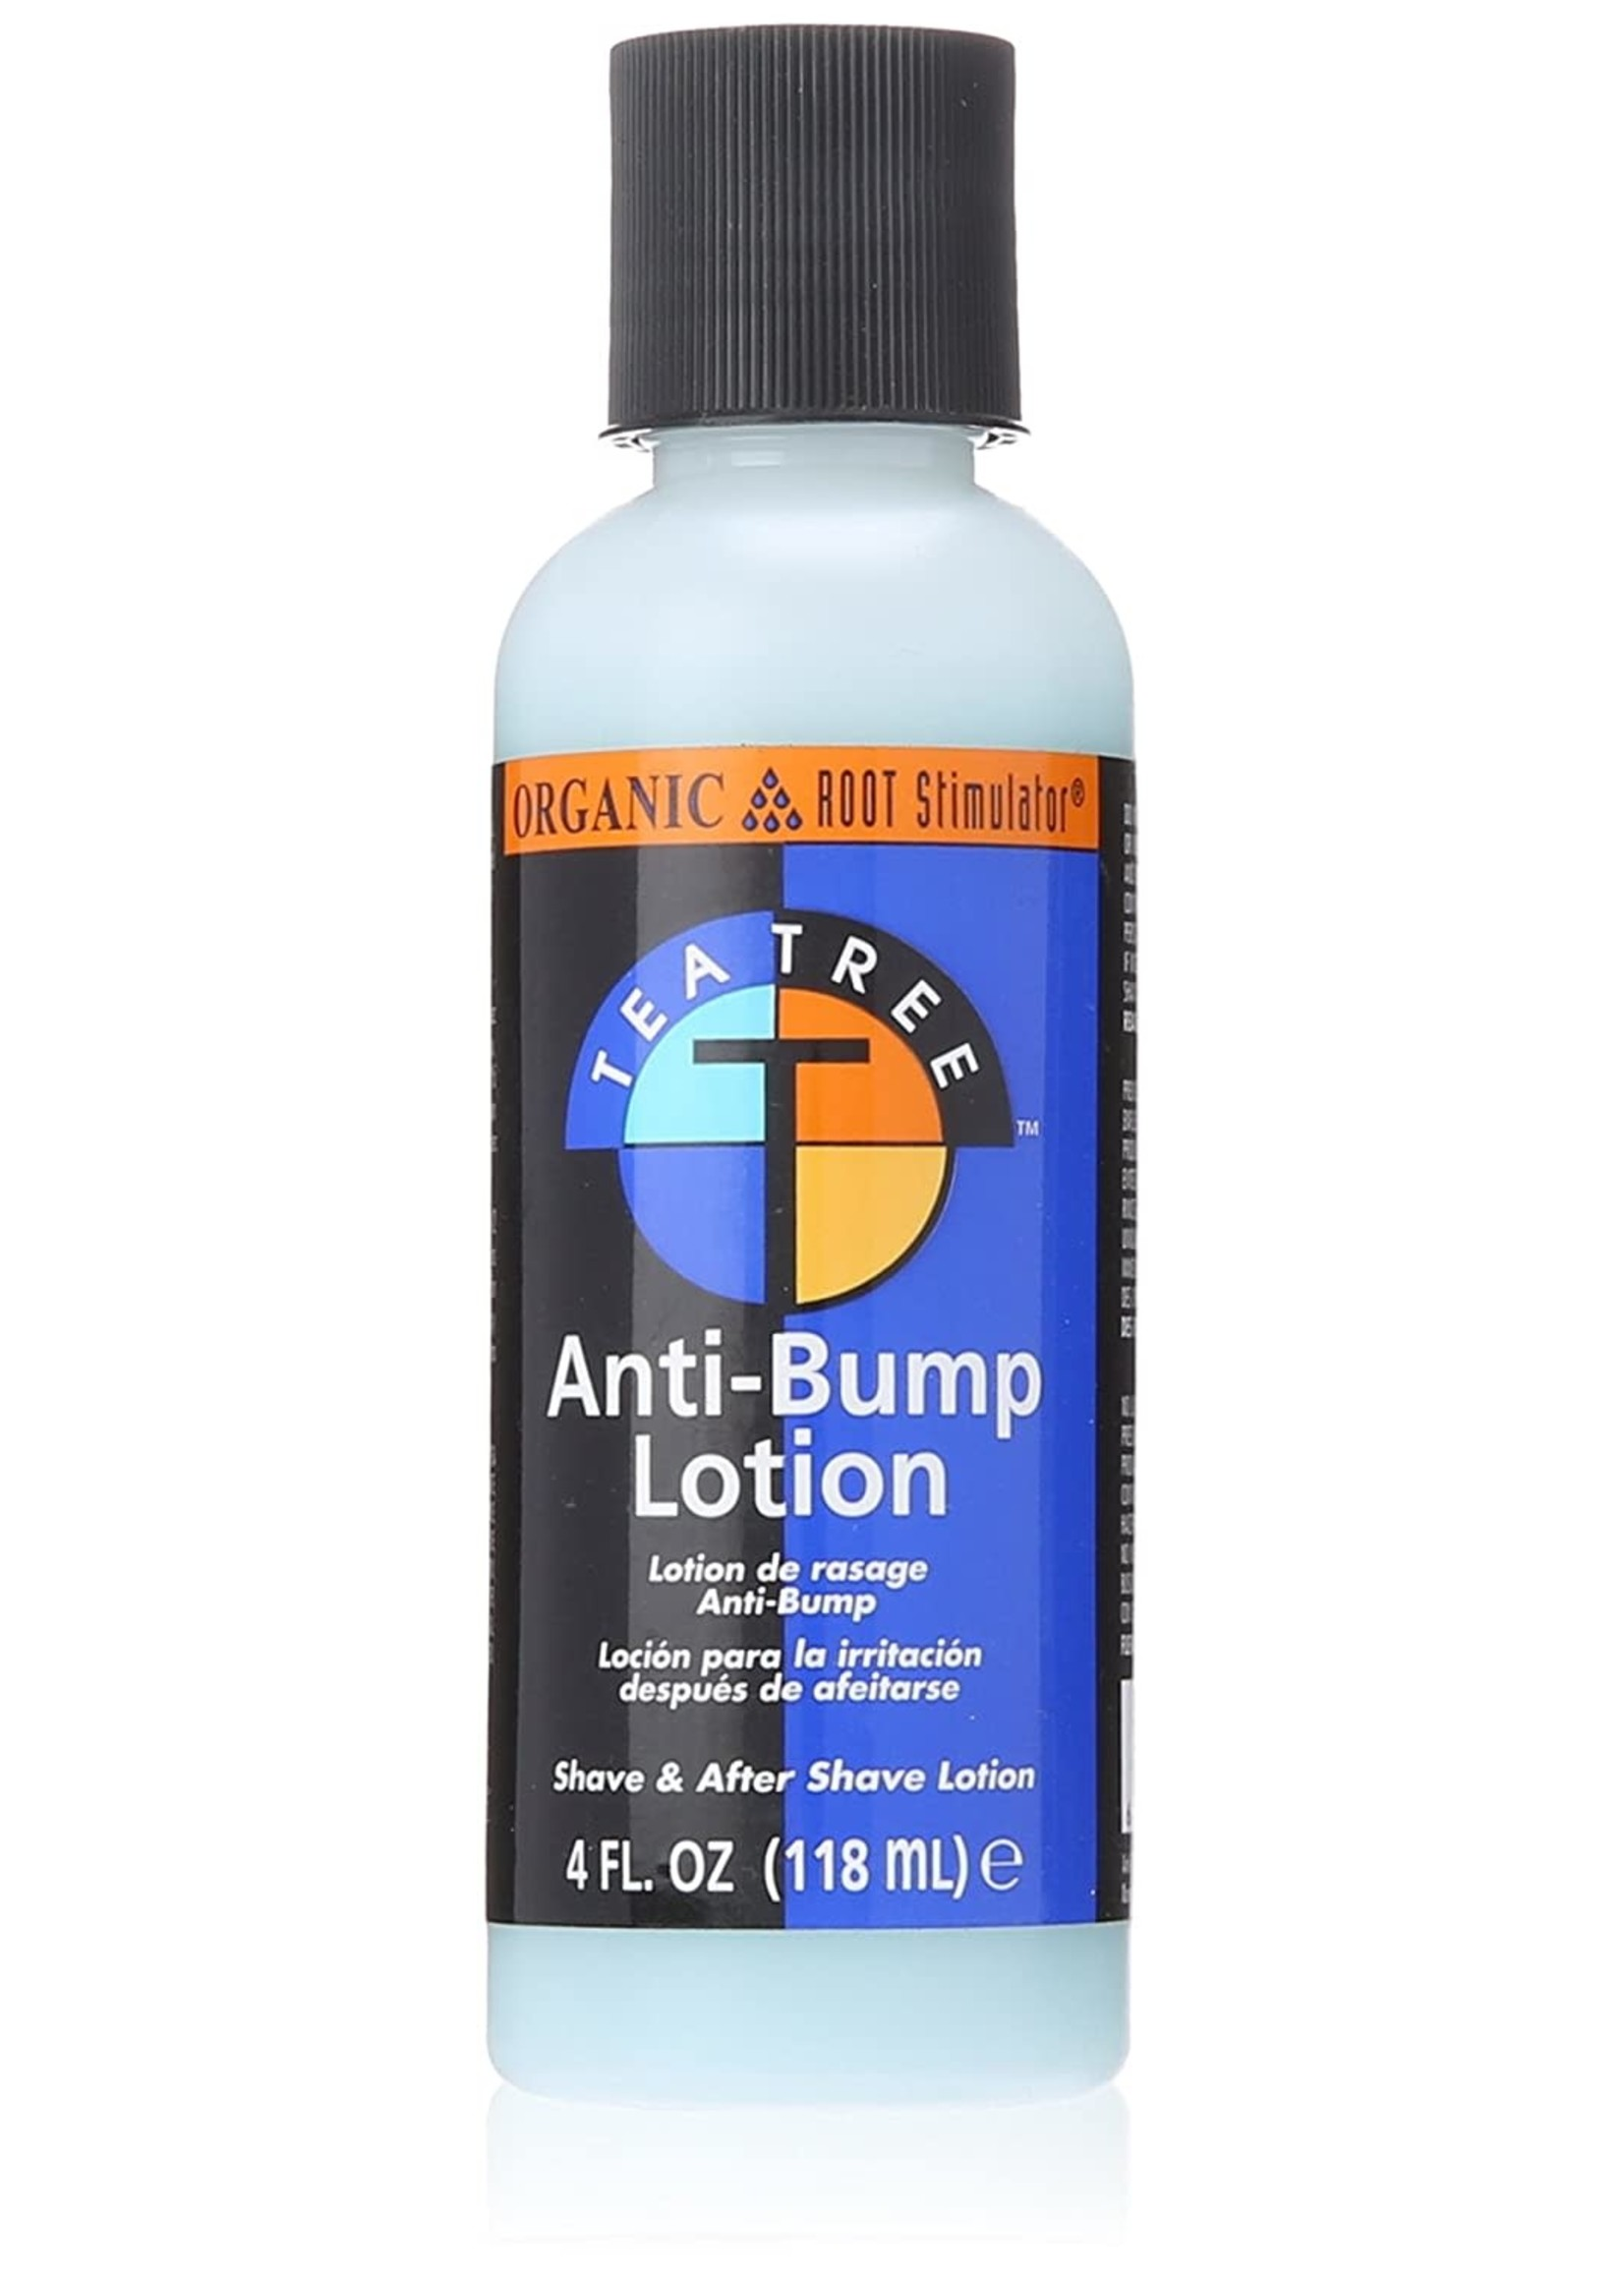 ORS Anti Bump Lotion Tea Tree